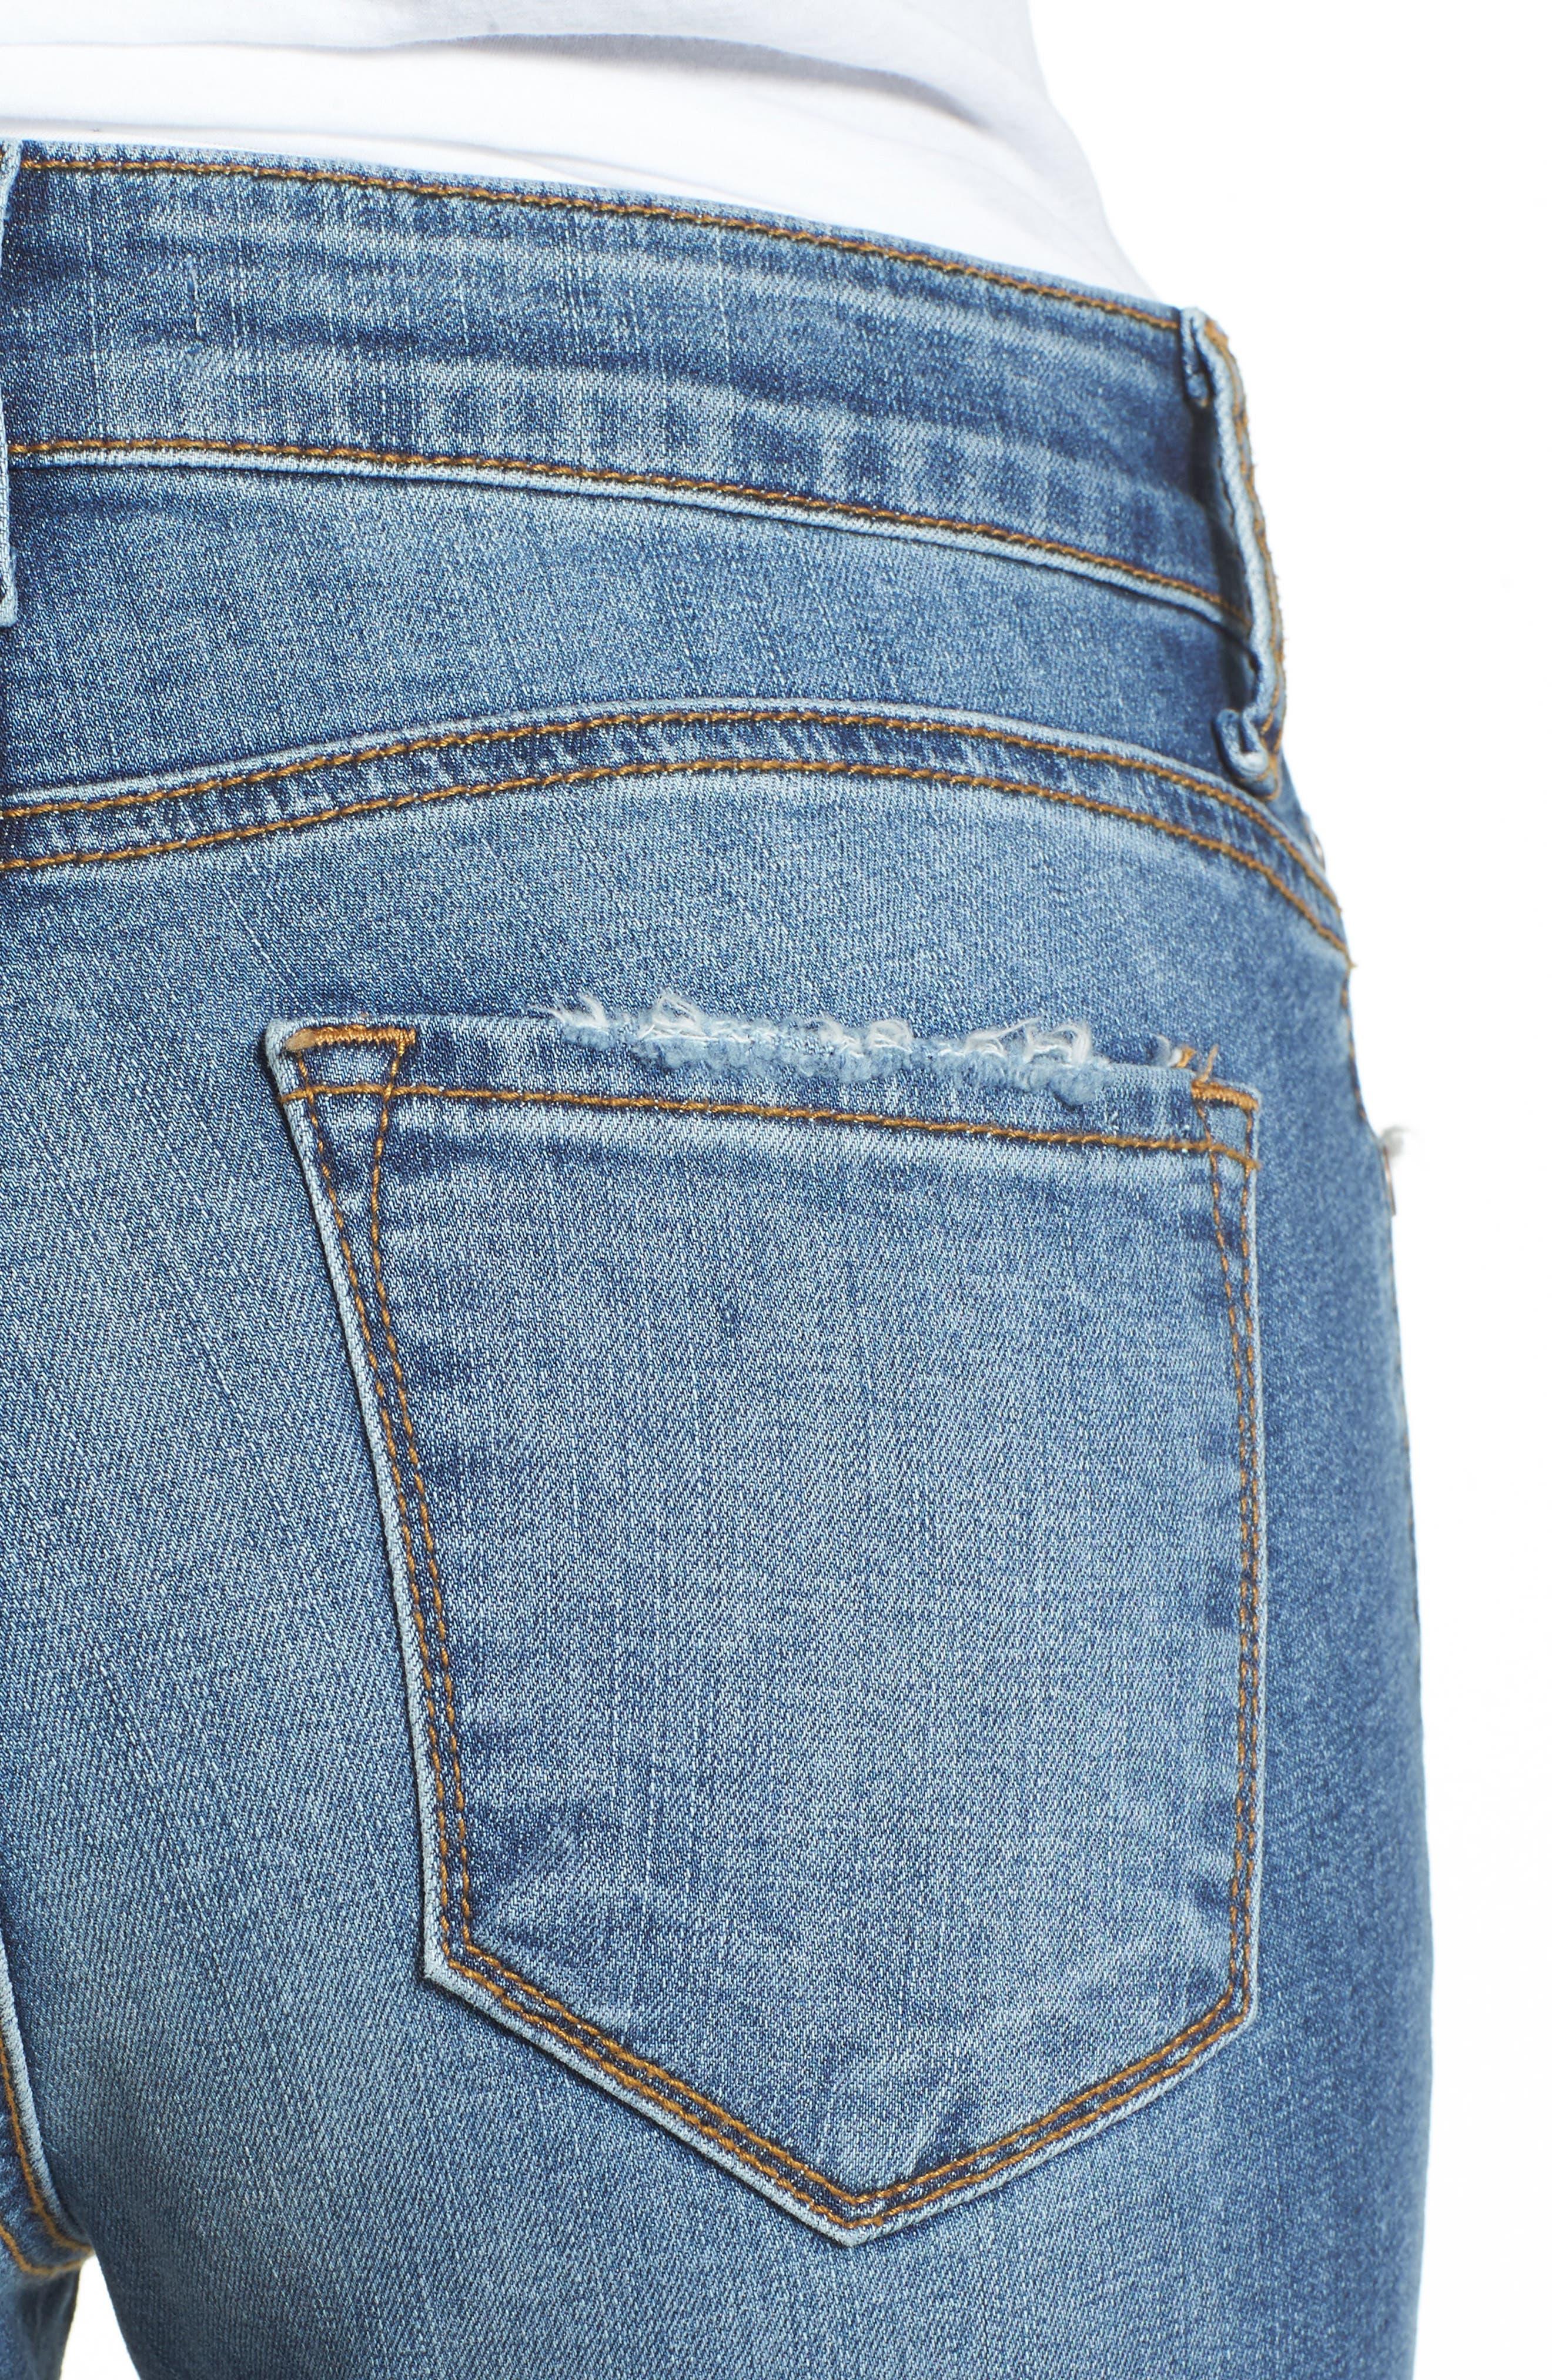 Alternate Image 4  - BP. Ripped Step Hem Skinny Jeans (Destroy Rinse)